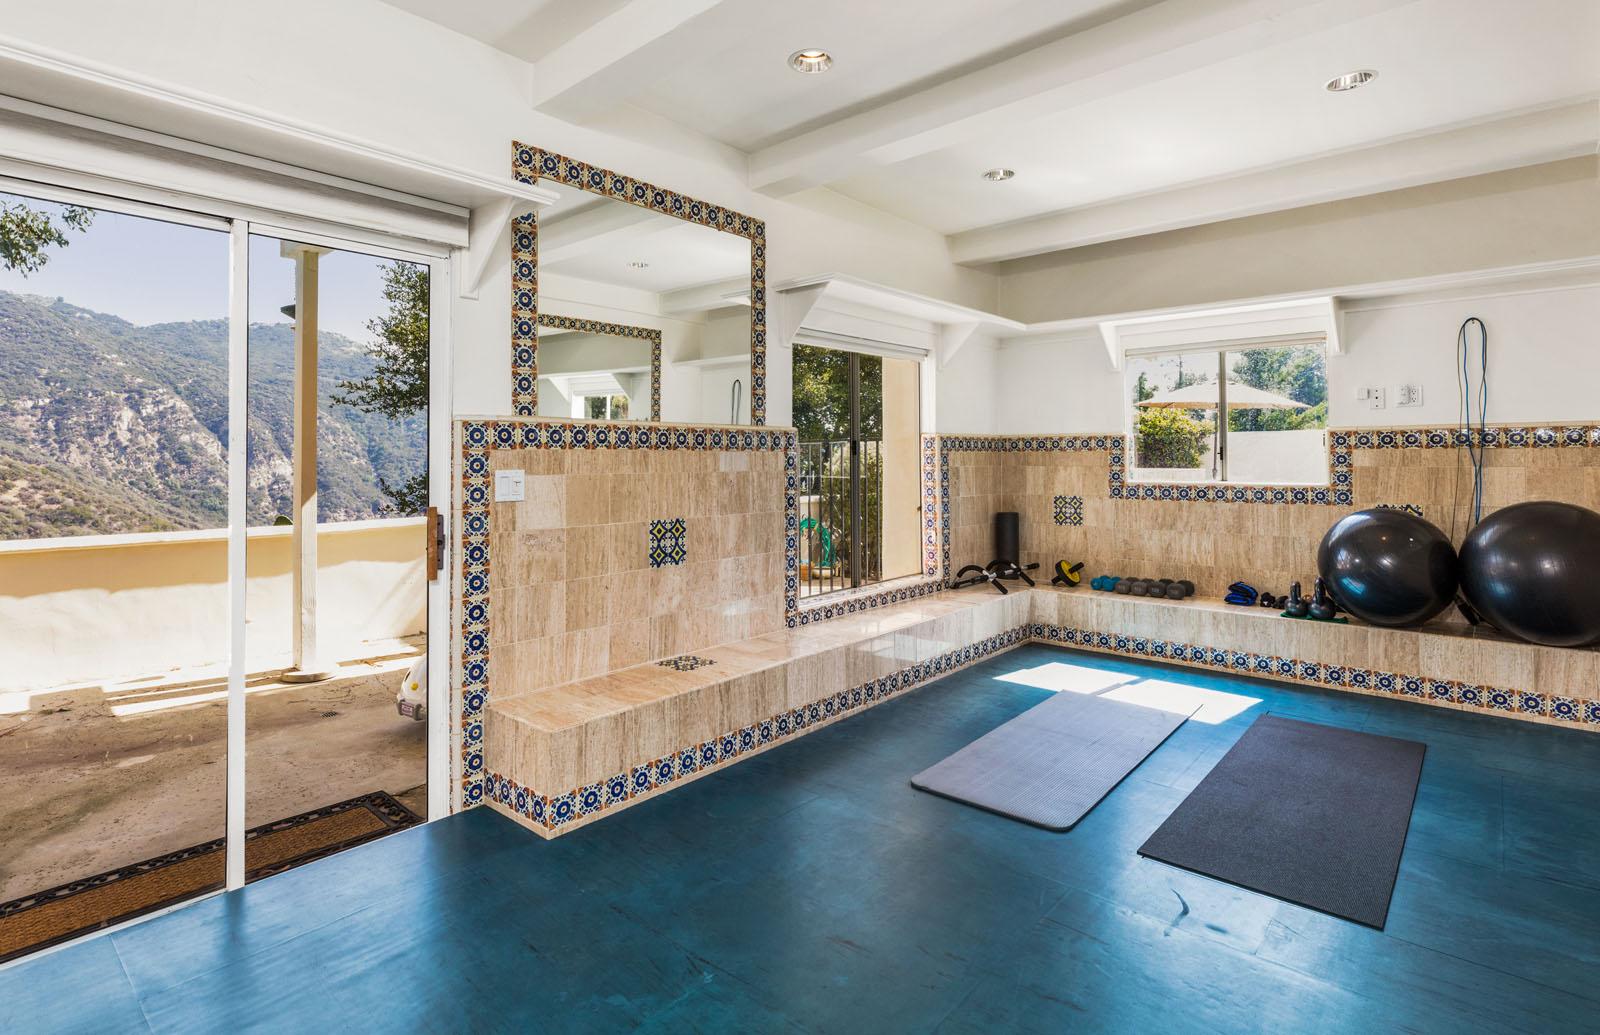 023 Yoga Room 1712 Manzanita Park Avenue Malibu For Sale Lease The Malibu Life Team Luxury Real Estate.jpg